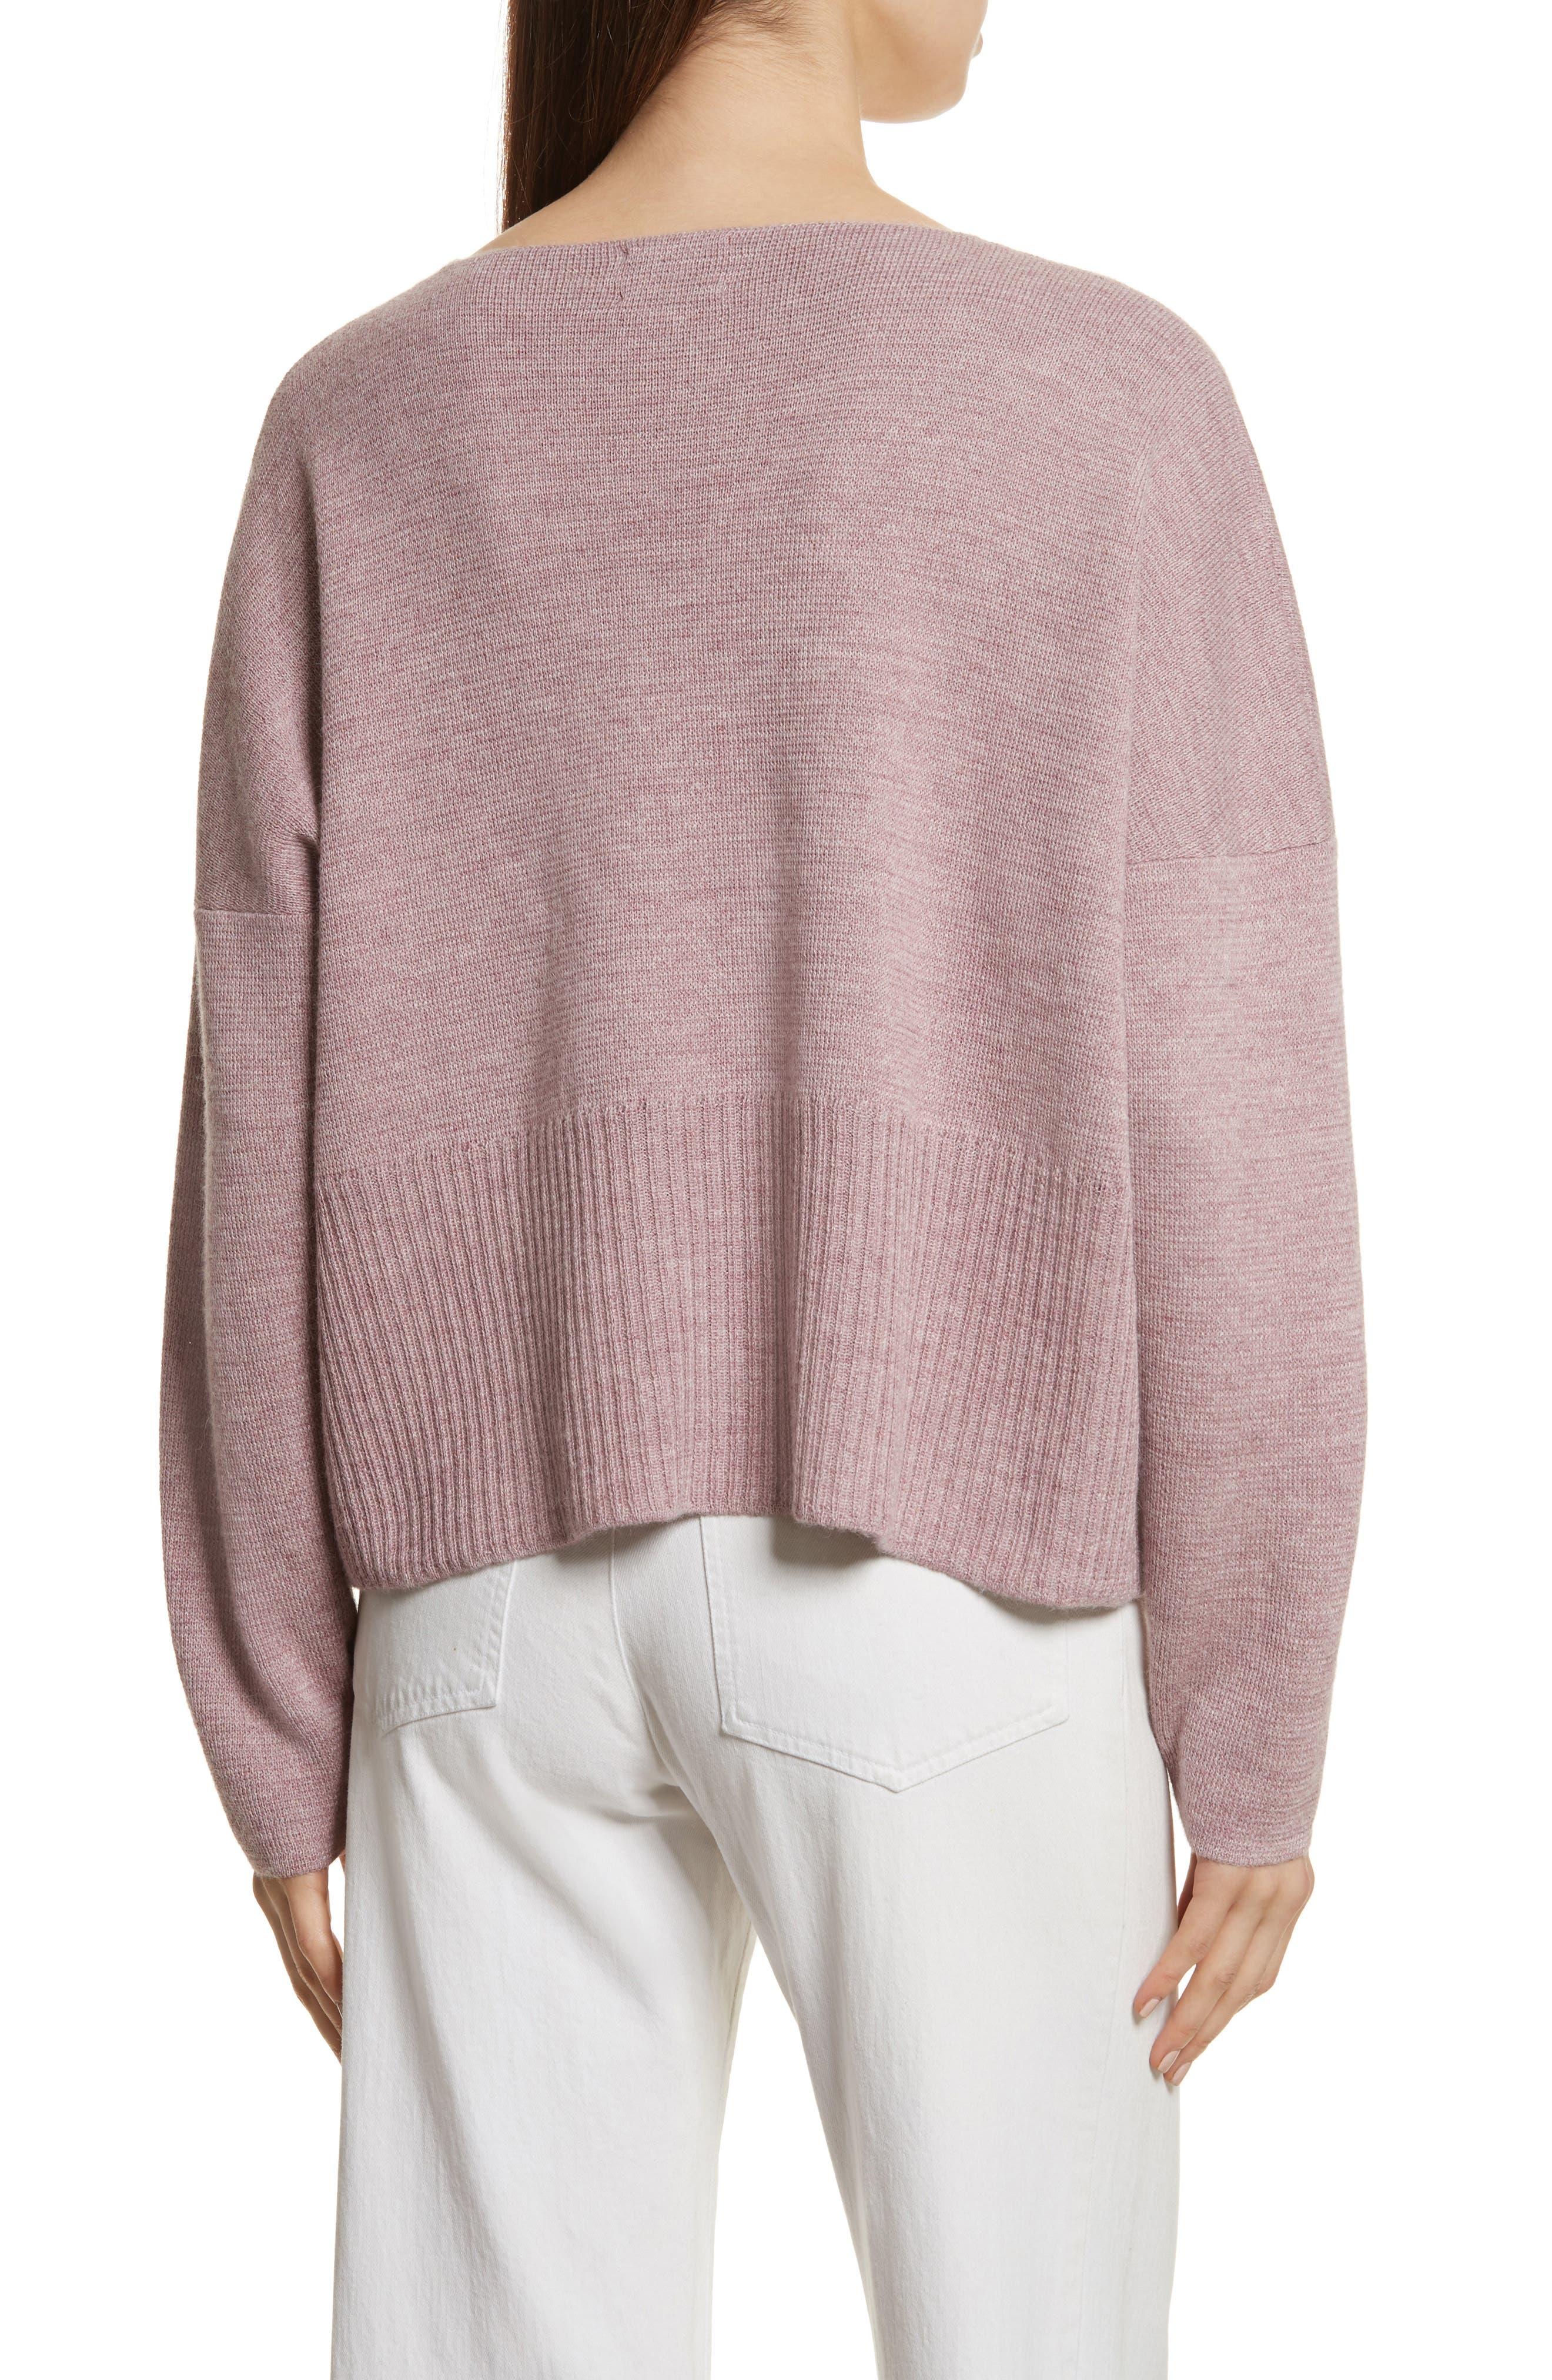 Fount Alpaca Hair Sweater,                             Alternate thumbnail 2, color,                             Lilac